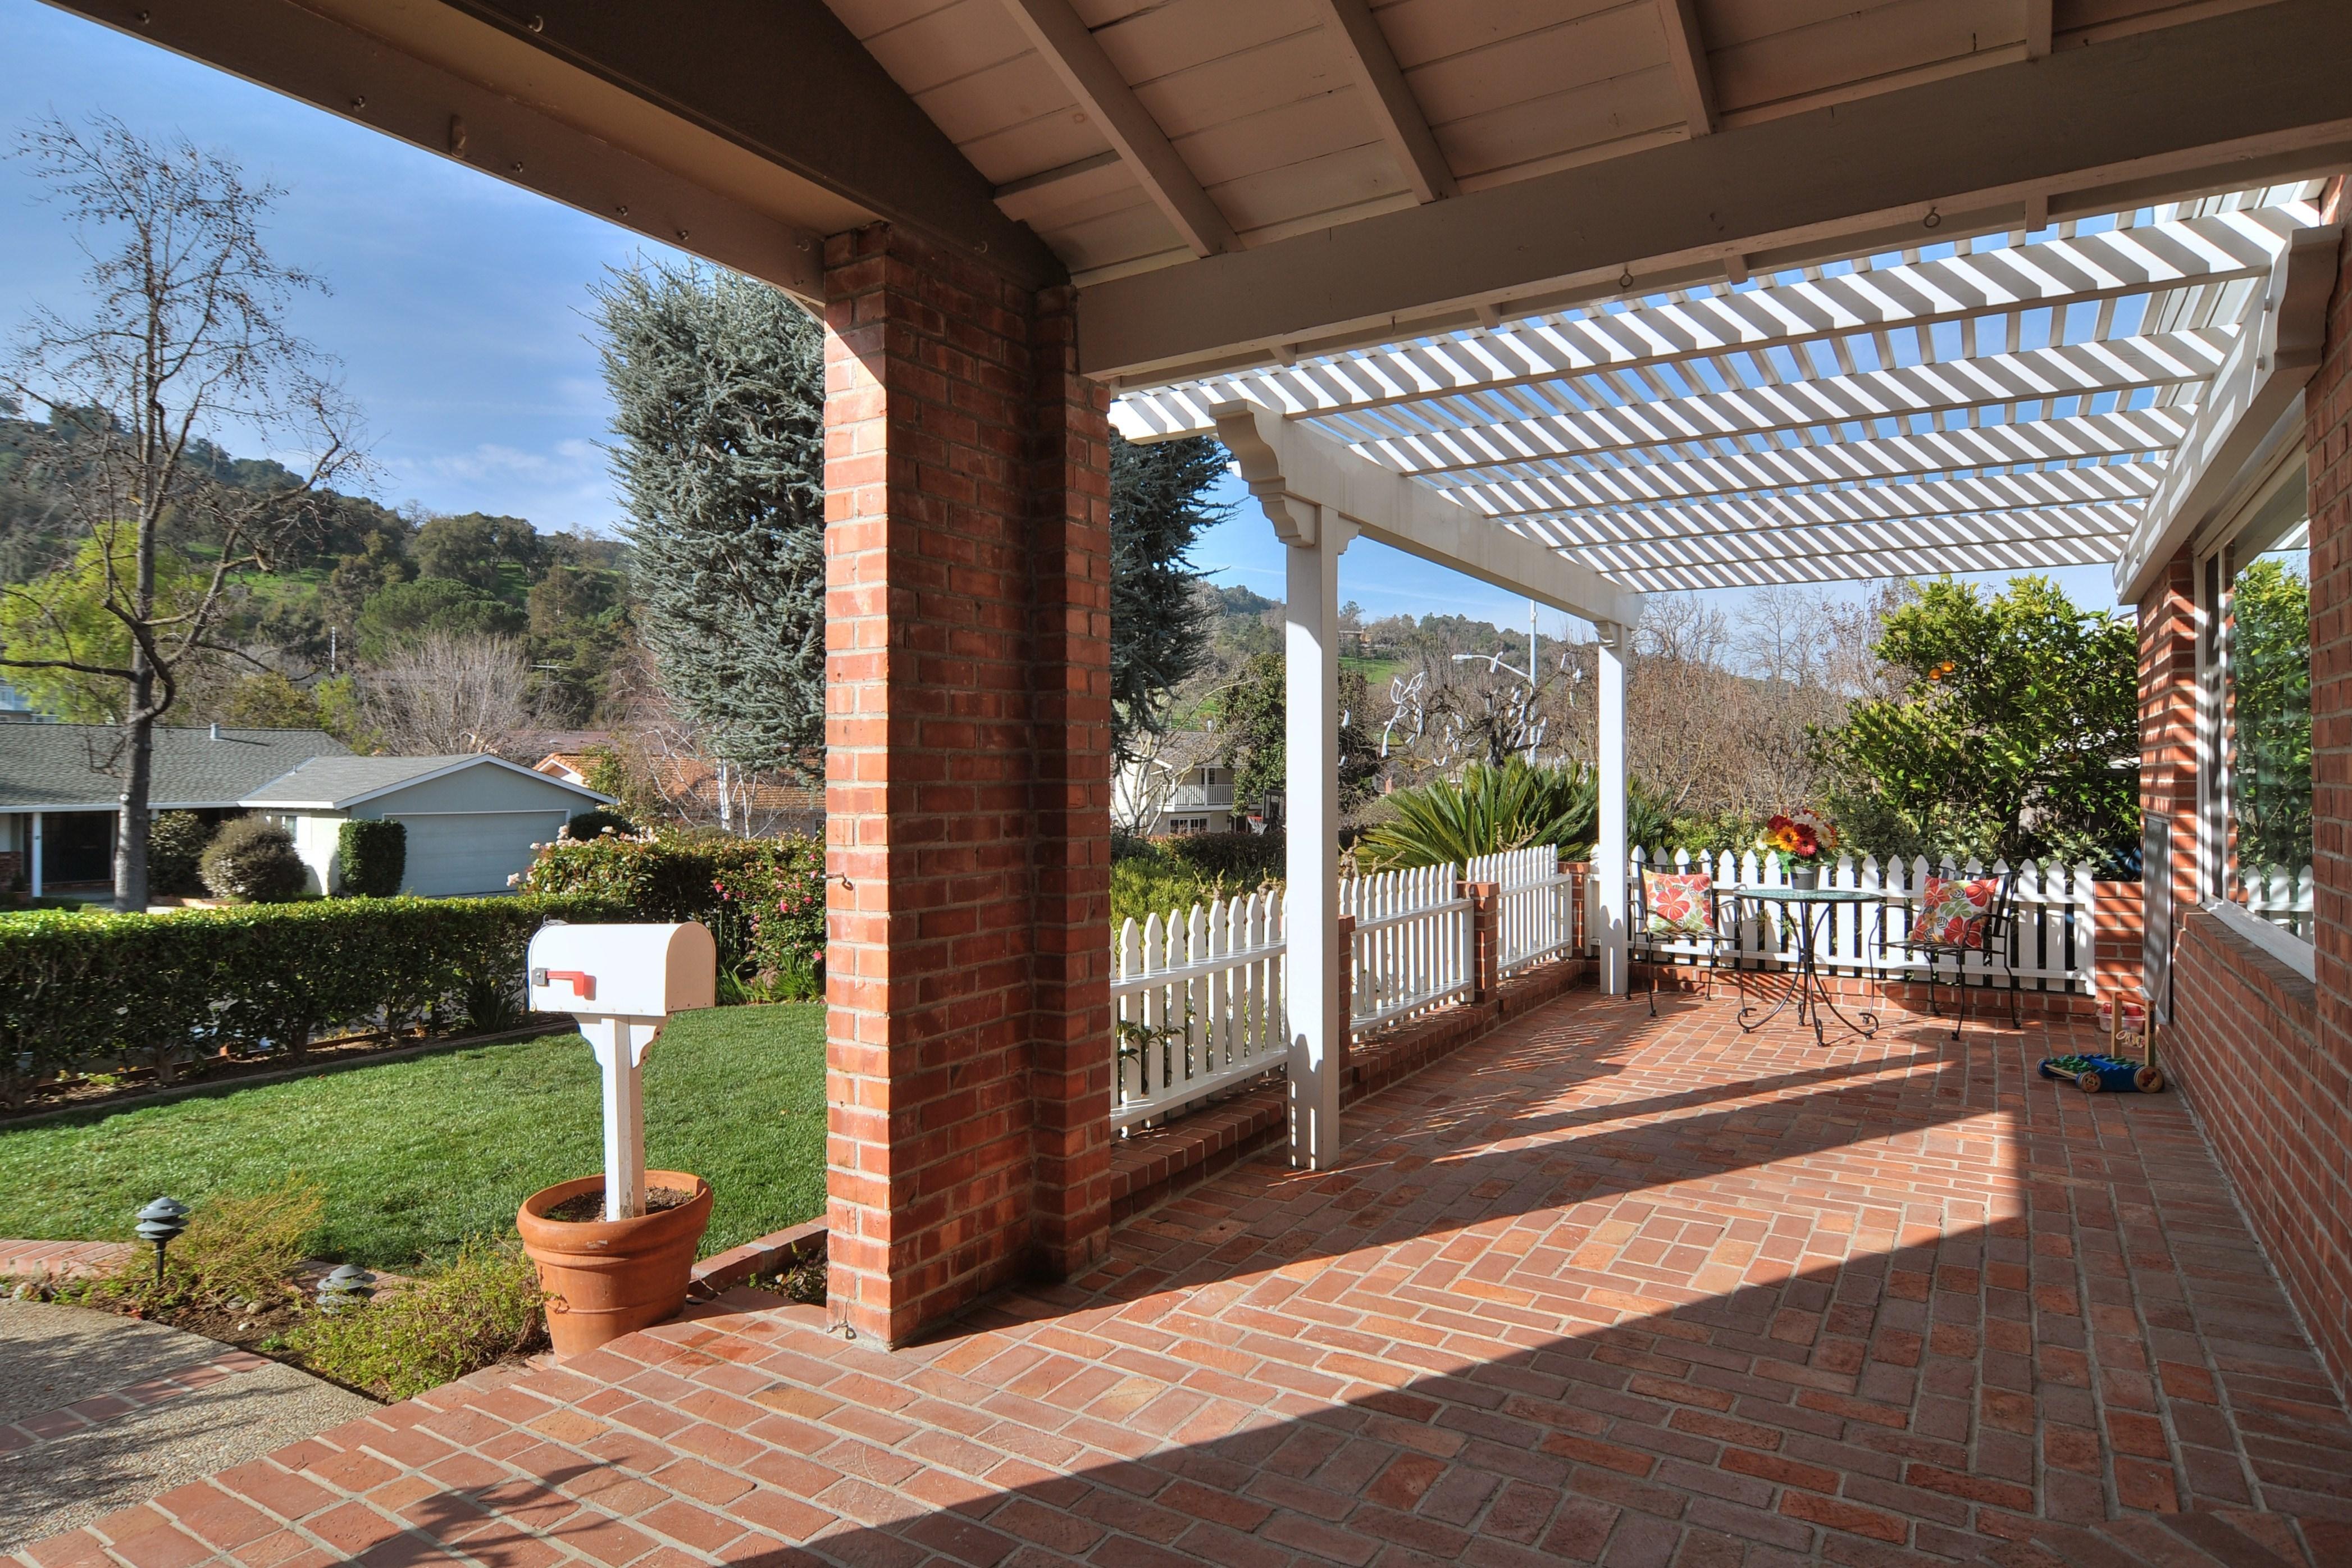 004 Front Porch - Exquisite, expansive, remodeled Belwood home - 127 Belhaven Drive, Los Gatos